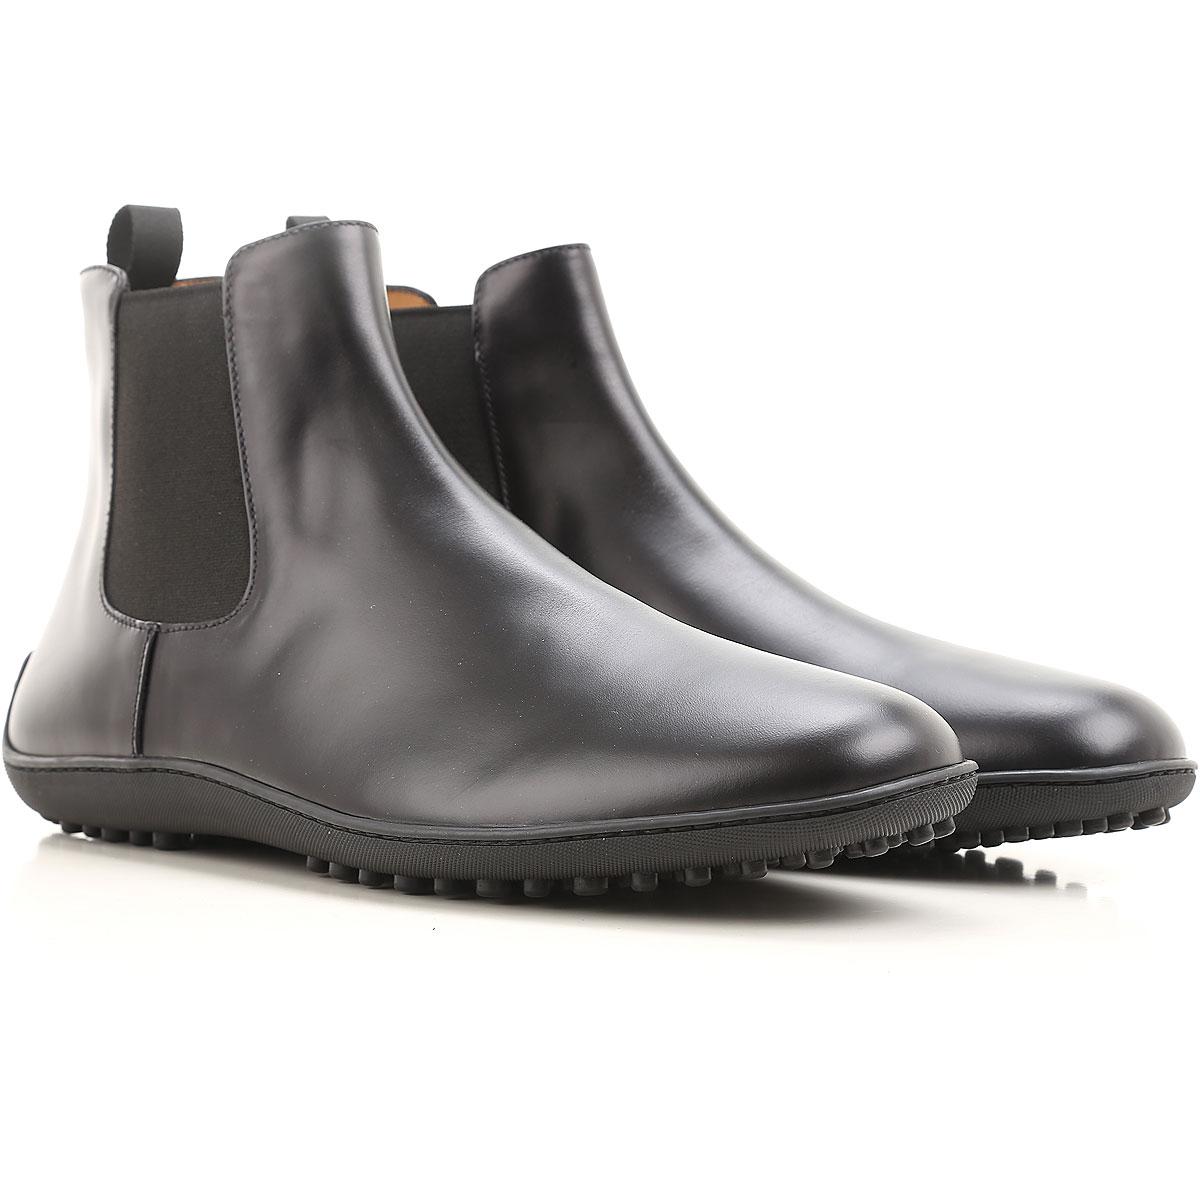 a14421fad682d Mens Shoes Car Shoe, Style code: kut740-b4l-f0002